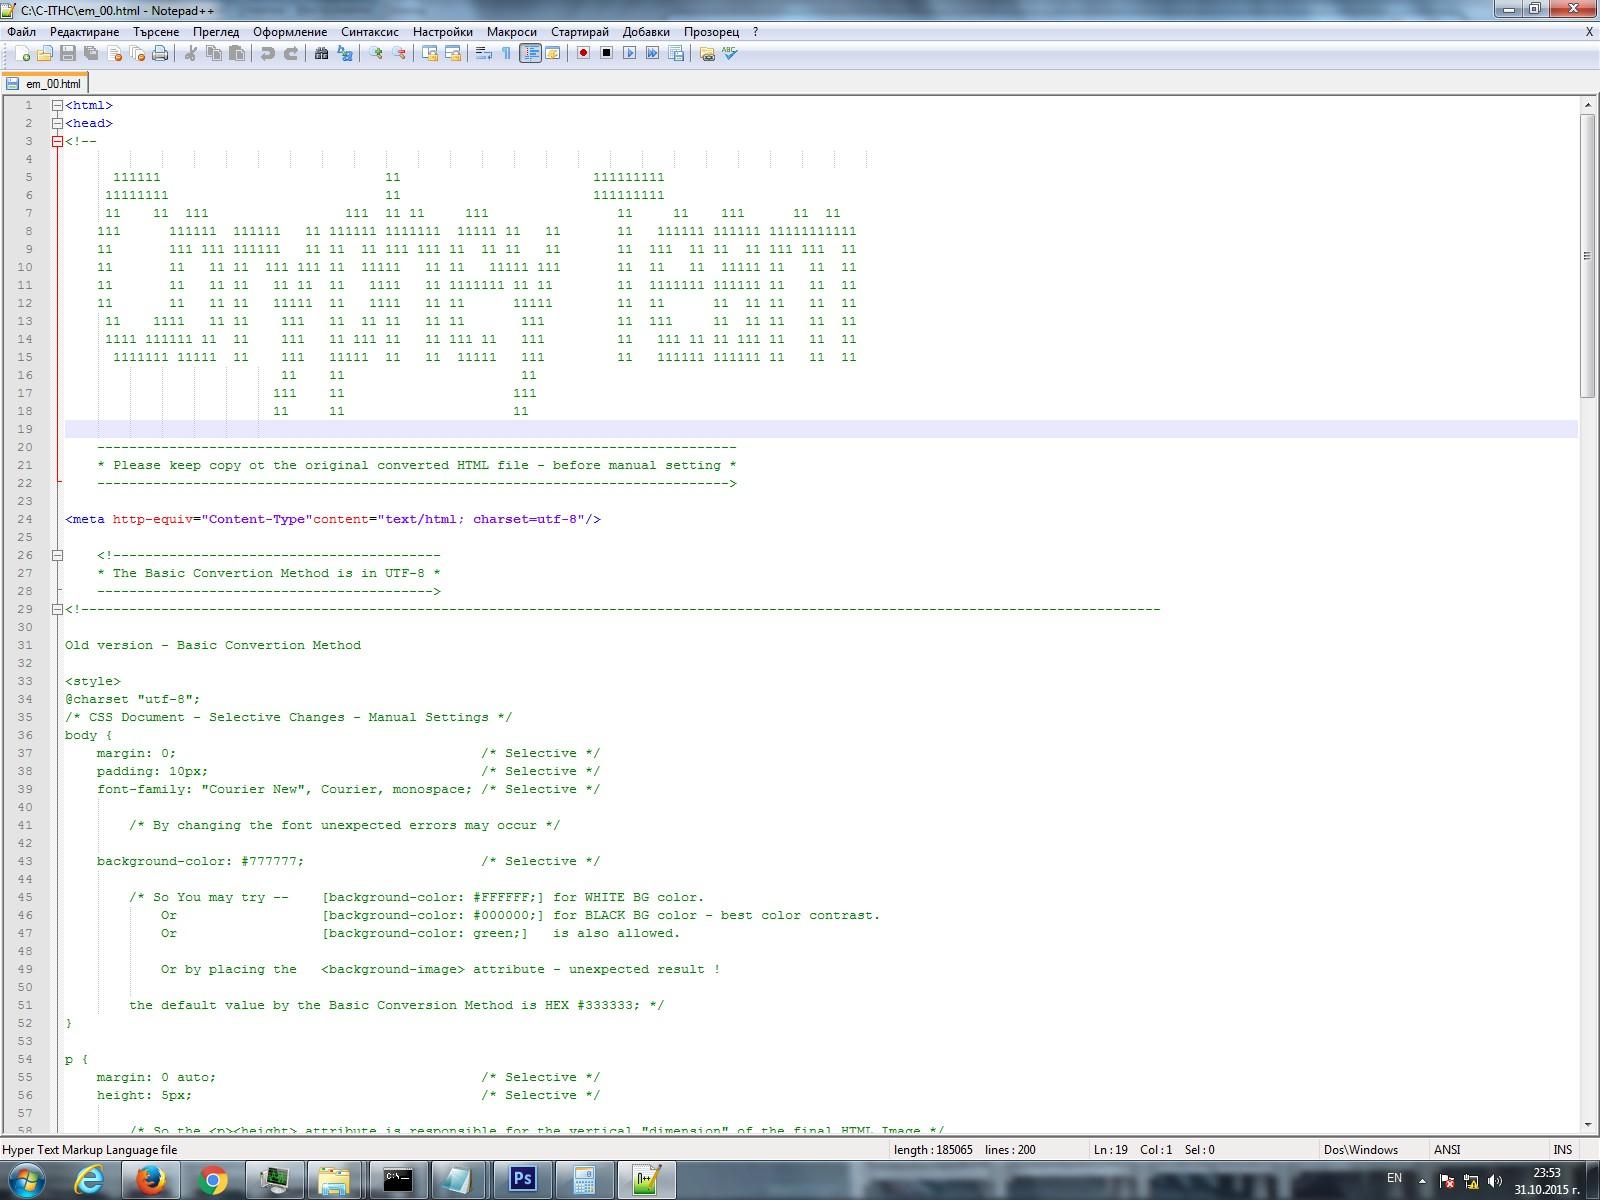 HTML_C-ITHC_Part.jpg